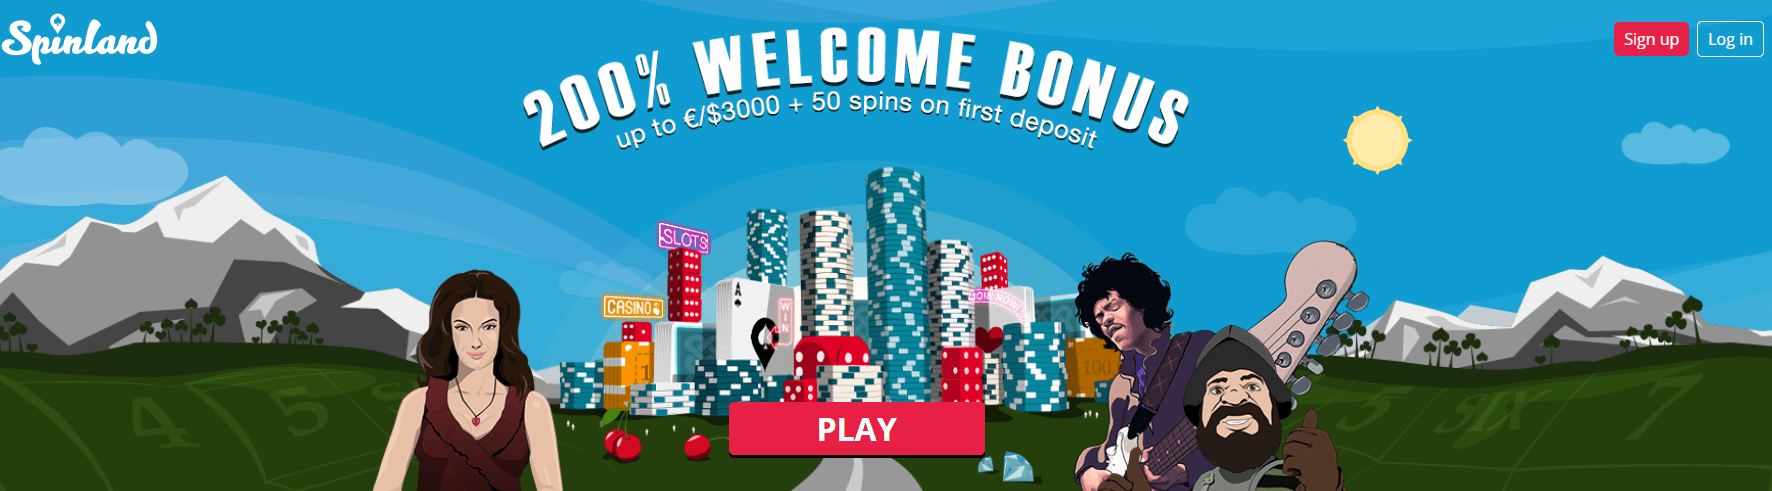 spinland bonus